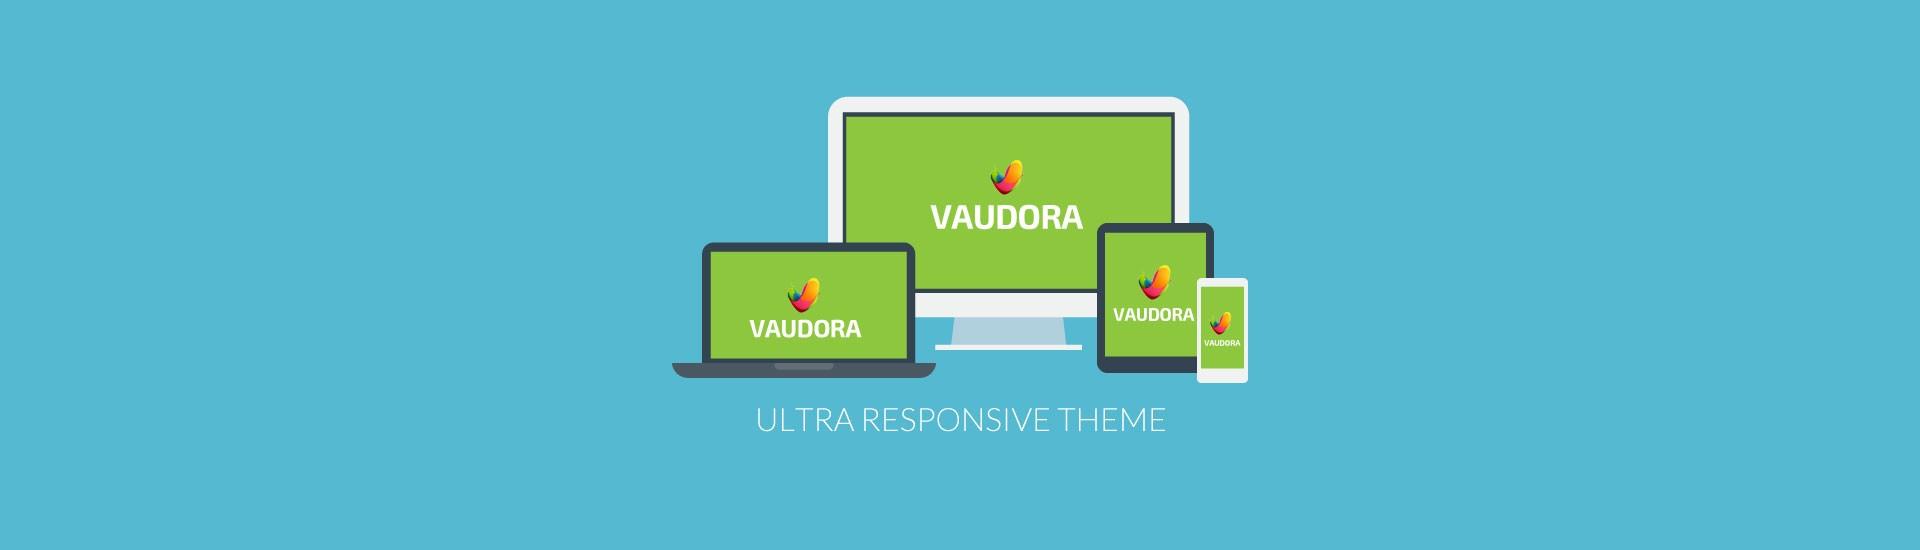 Ultra Responsive Design